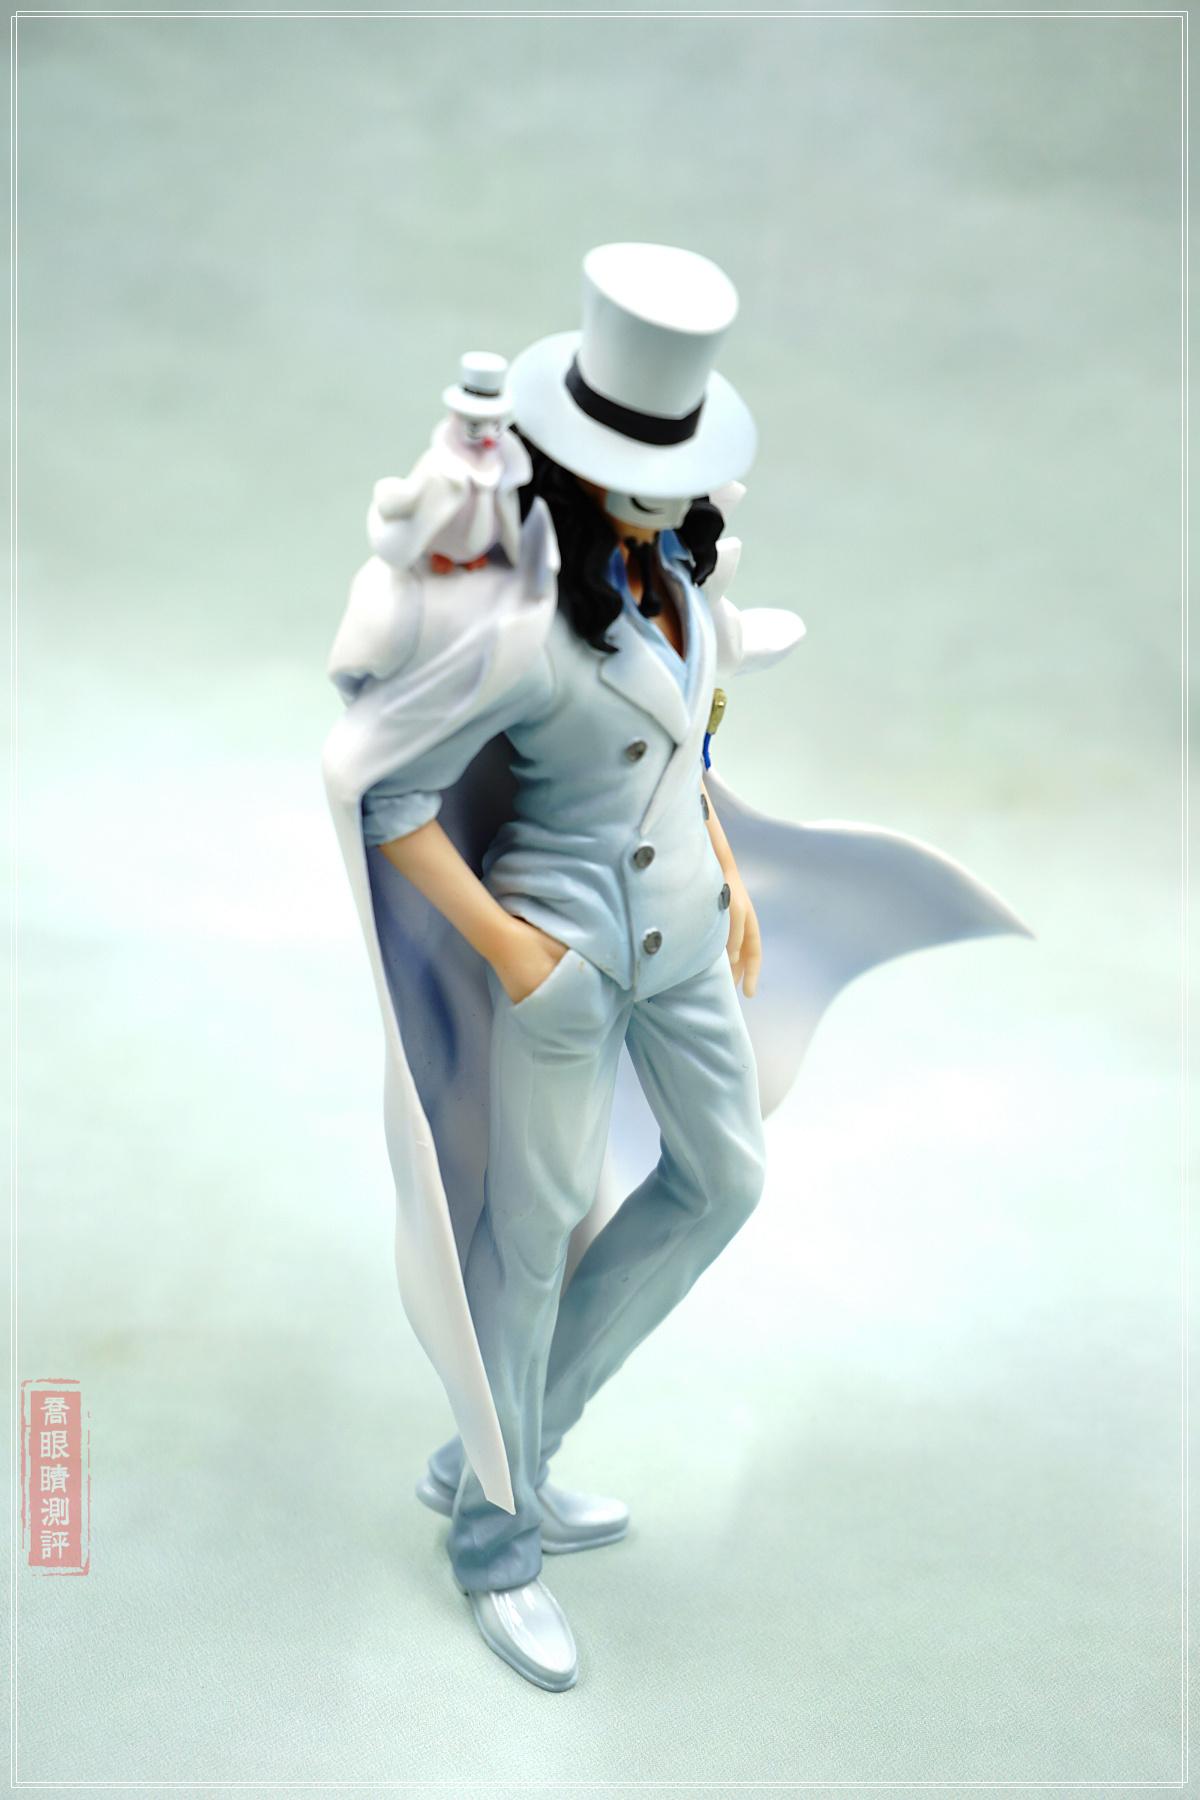 bandai rob_lucci hattori shueisha oda_eiichiro toei_animation figuarts_zero inc. fuji_television_network one_piece_film_gold